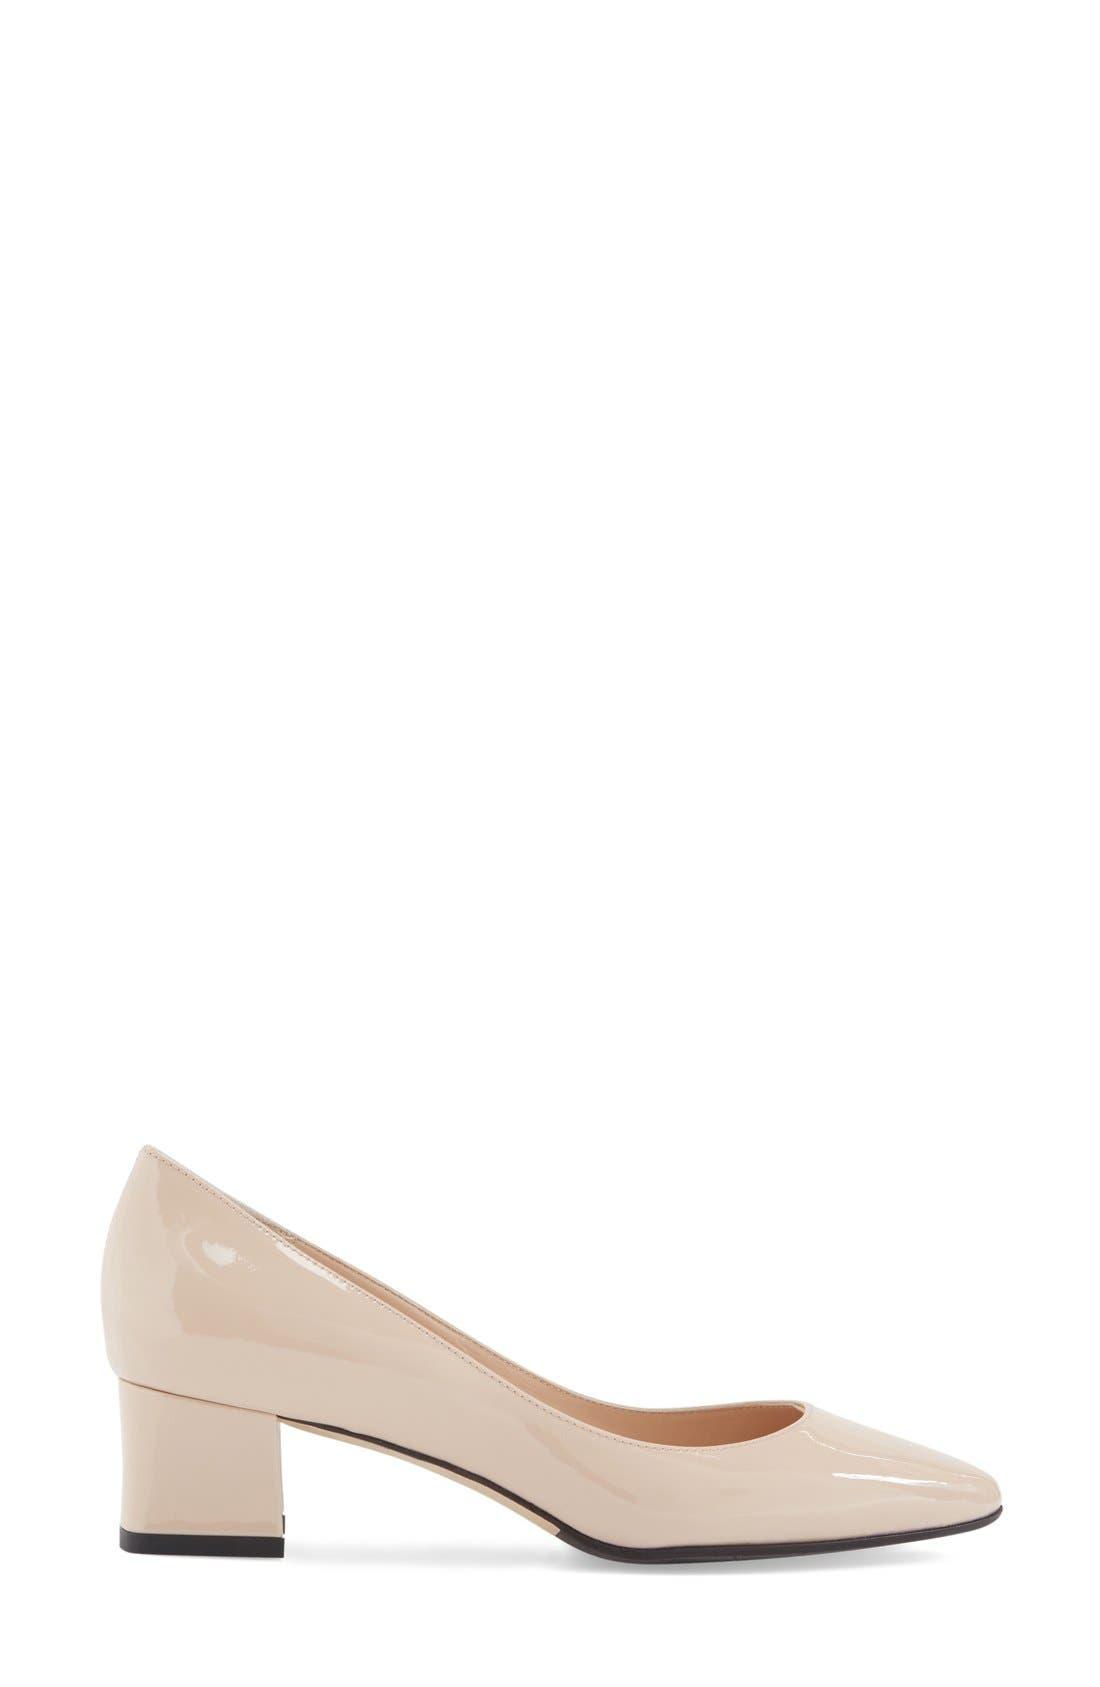 'Pheobe' Weatherproof Almond Toe Pump,                             Alternate thumbnail 65, color,